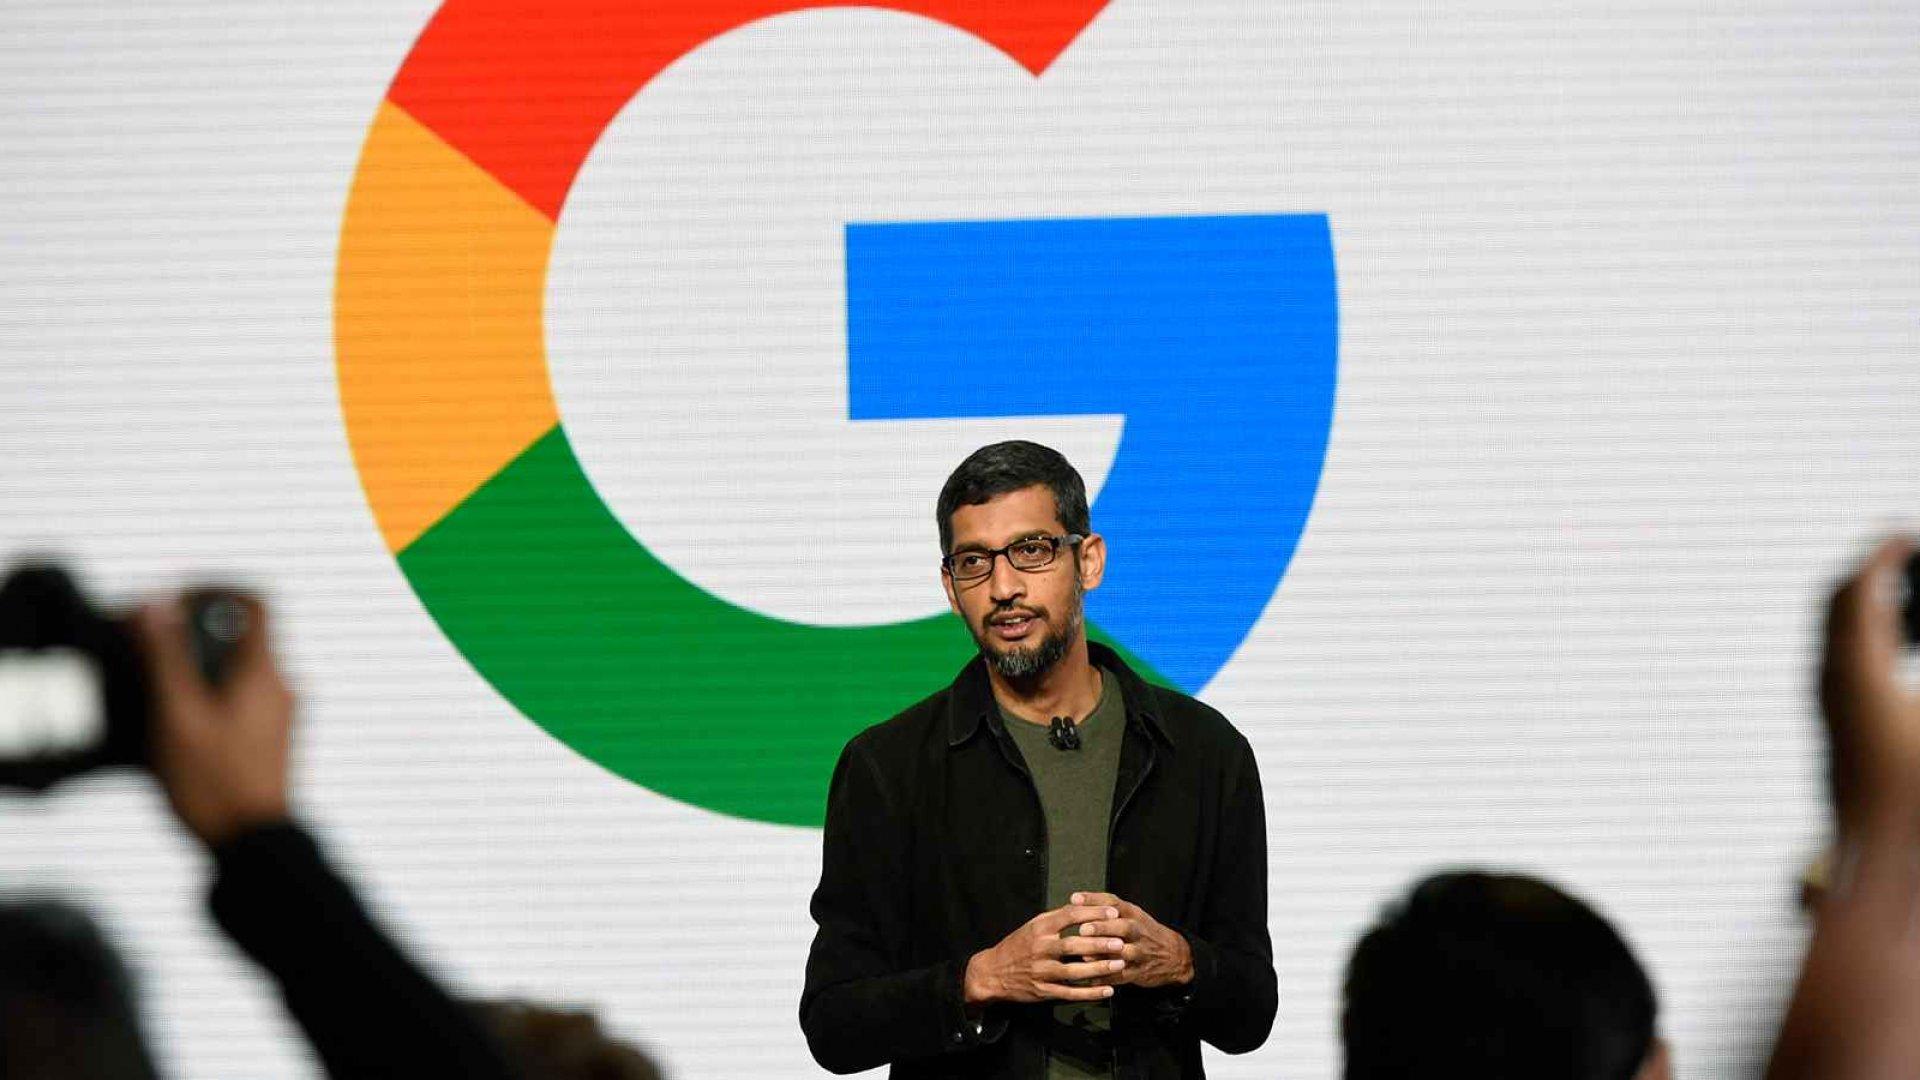 Sundar Pichai, chief executive officer of Google Inc.